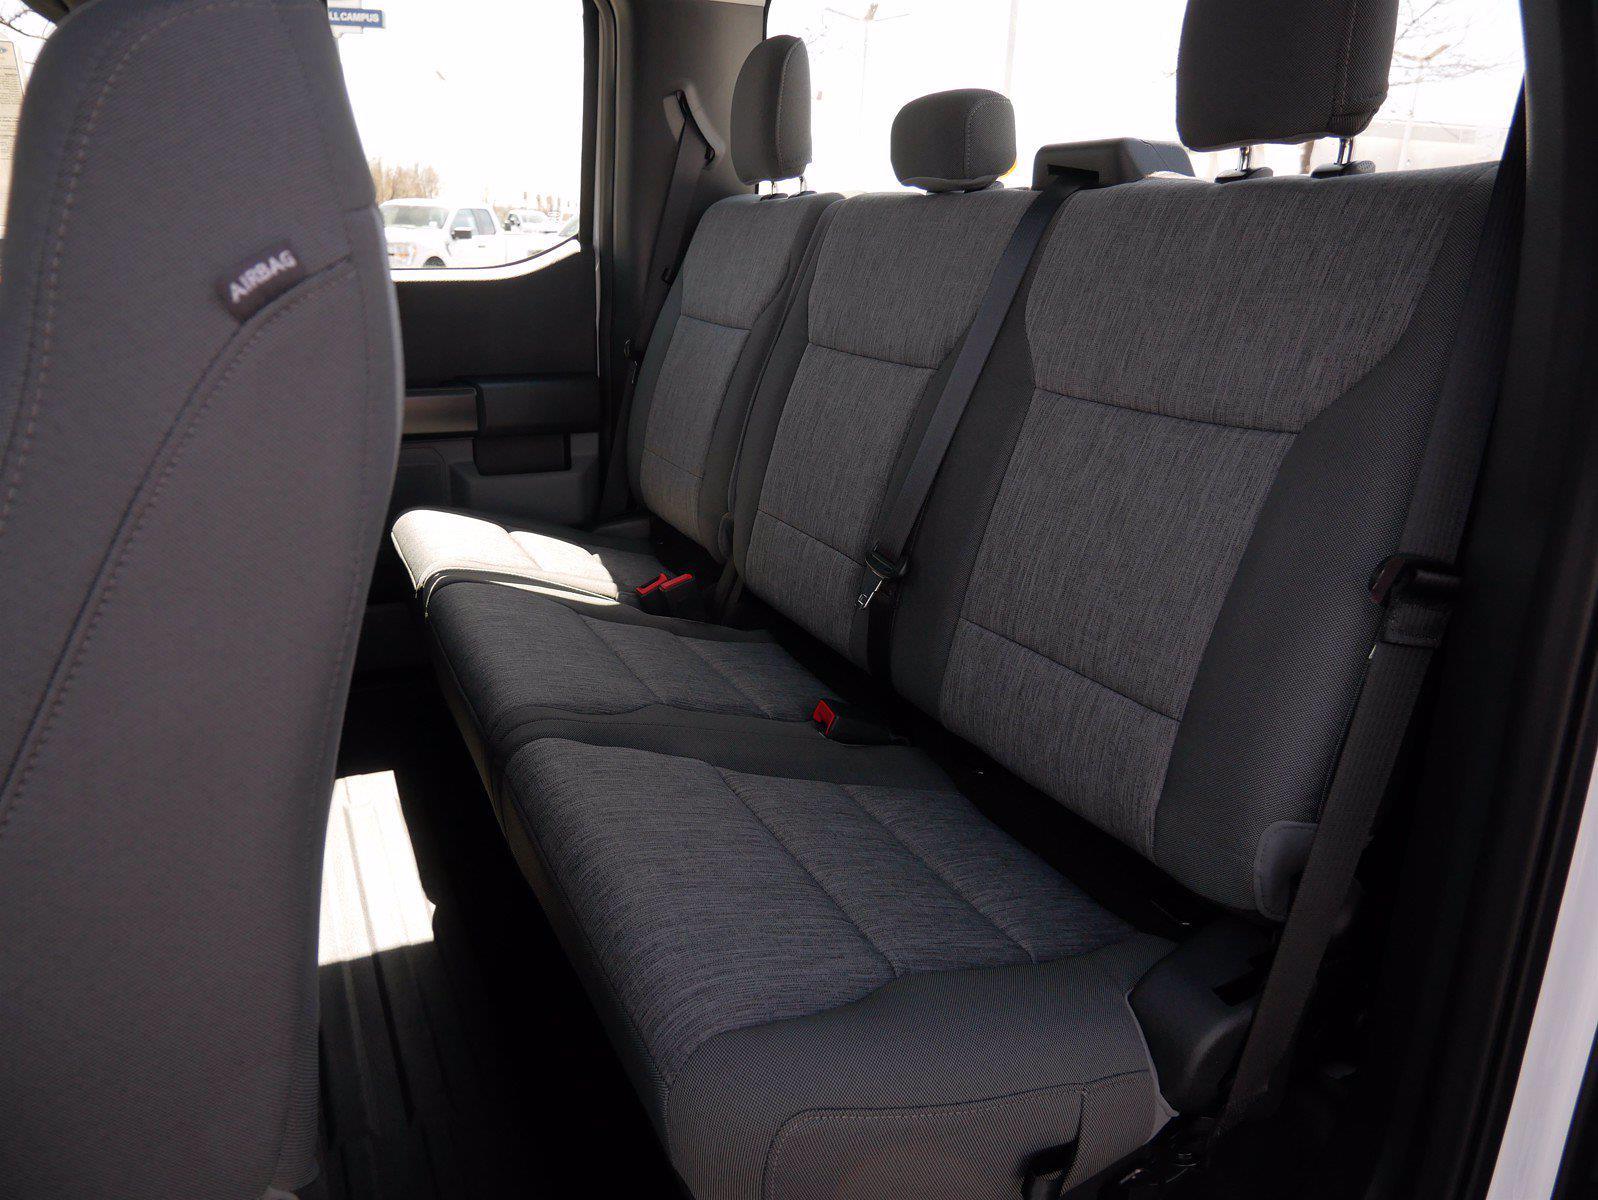 2021 Ford F-150 Super Cab 4x4, Pickup #64068 - photo 23